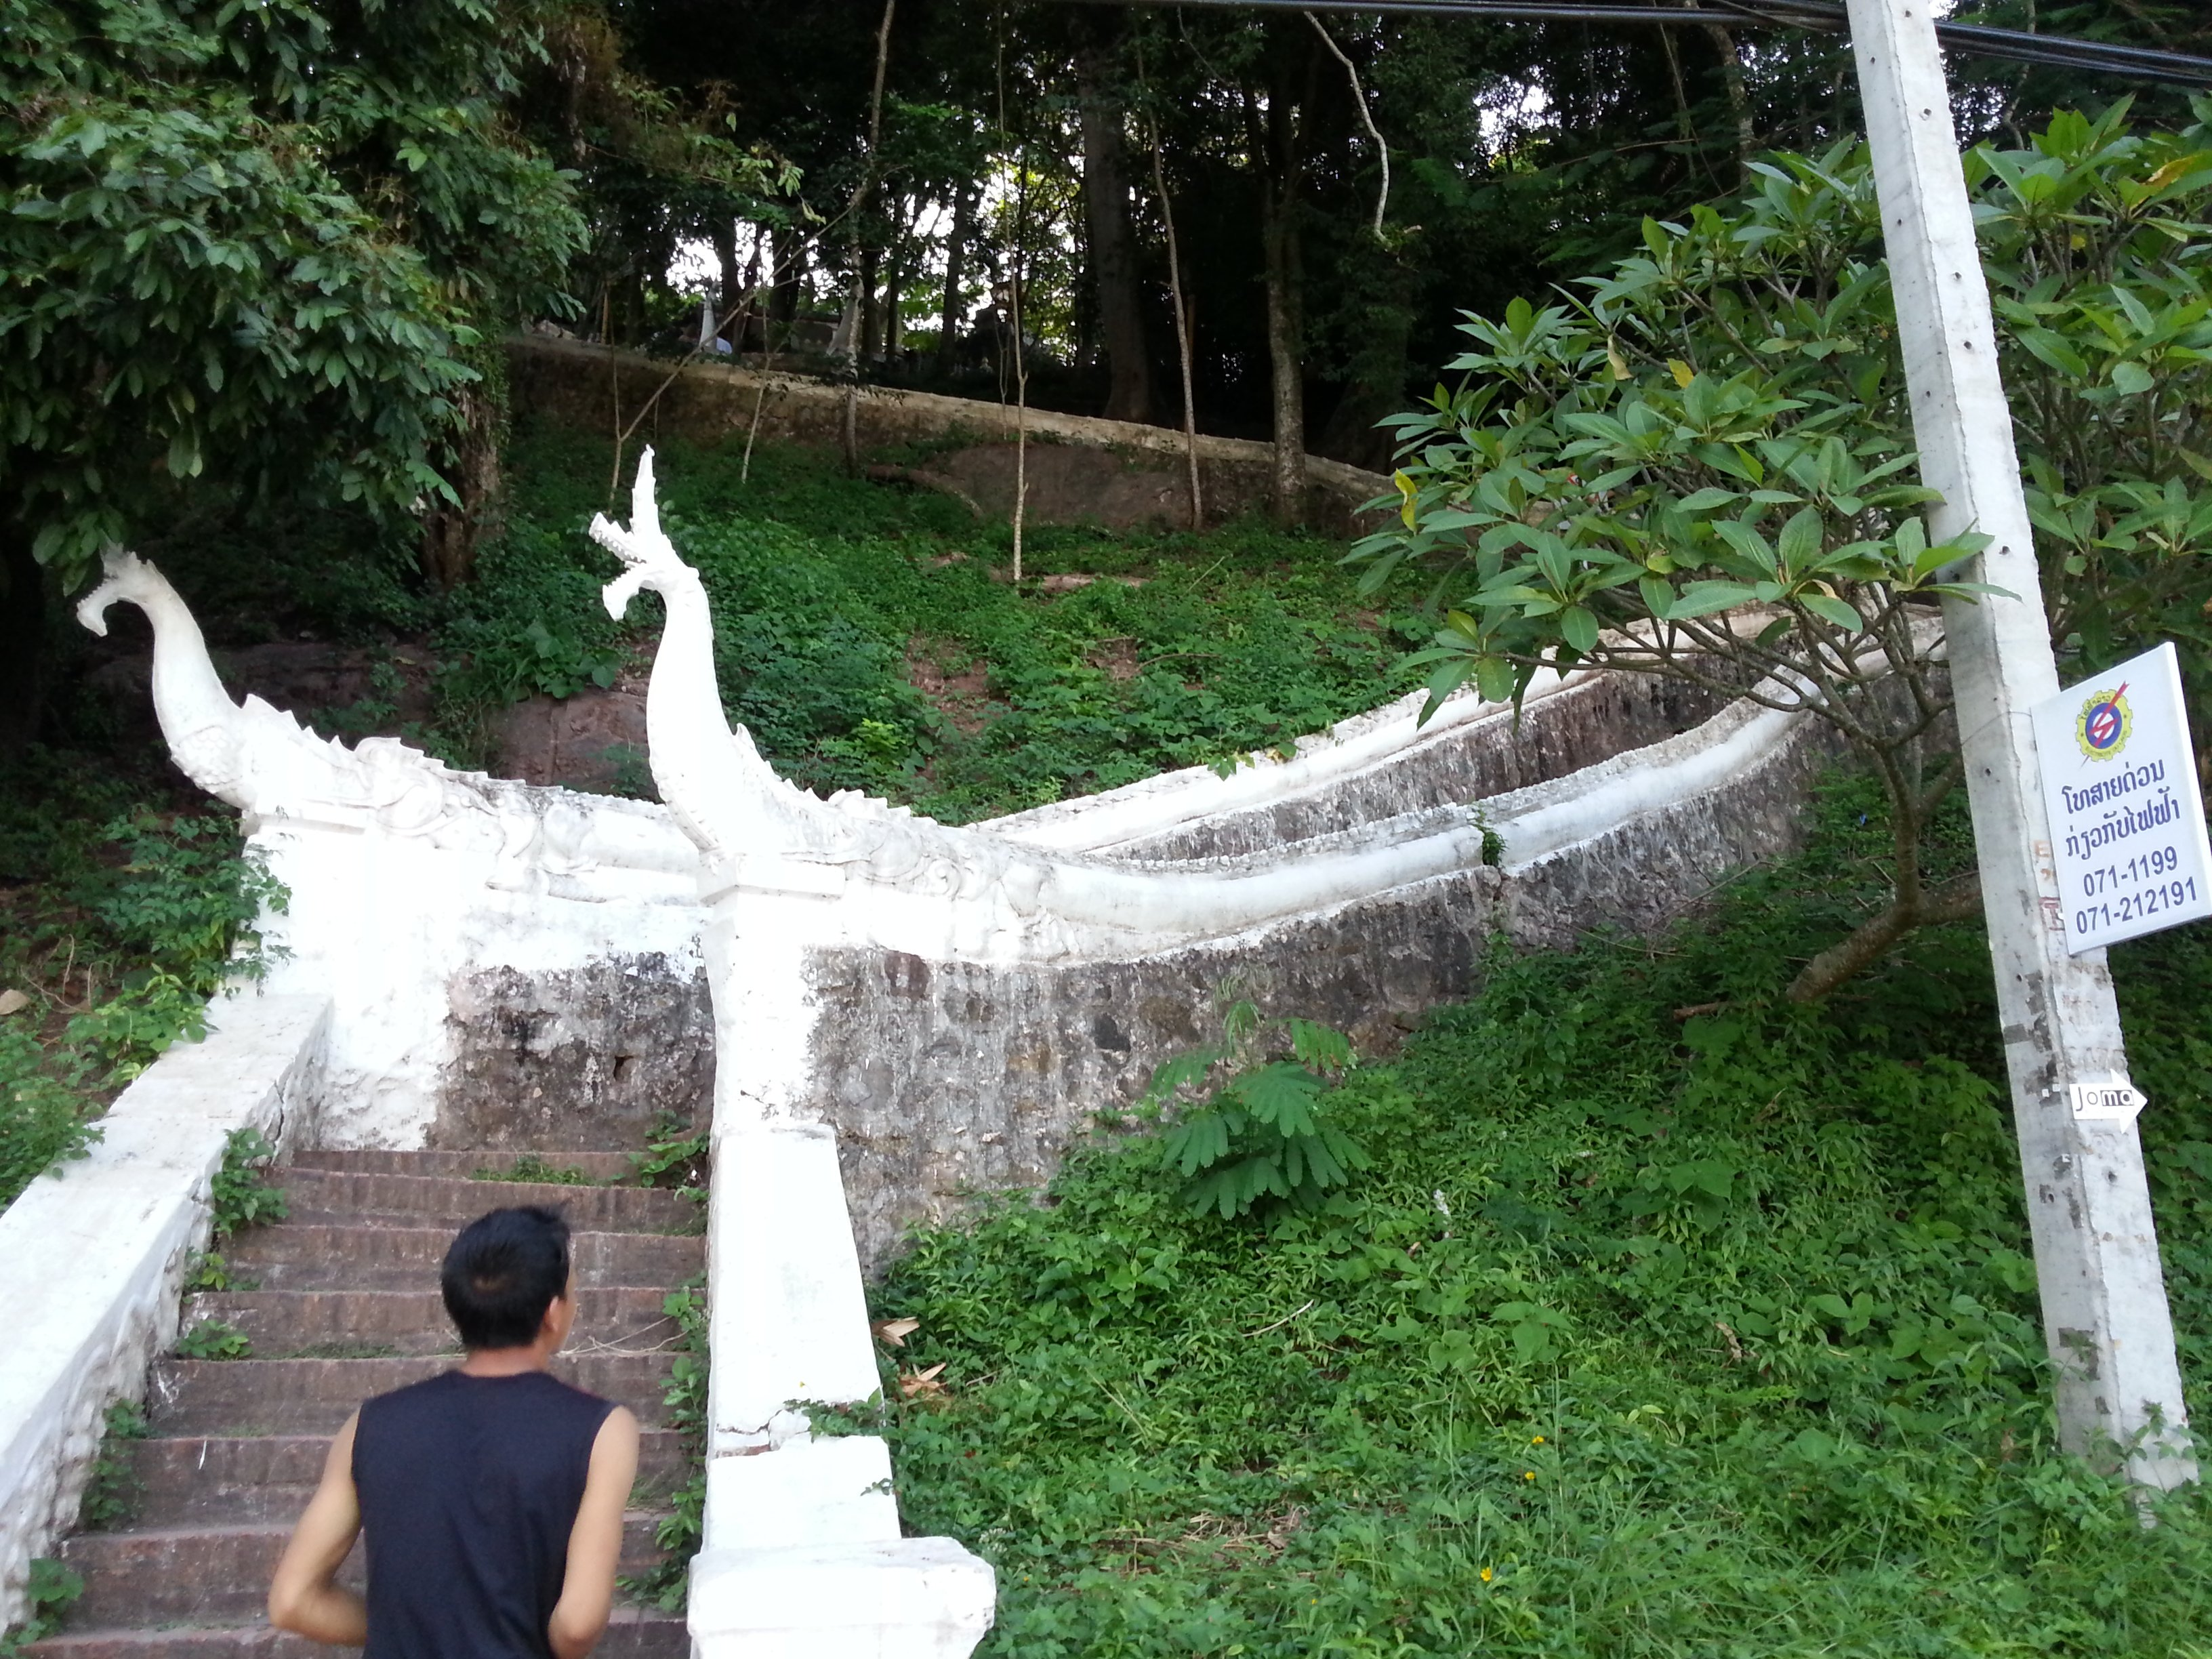 Kingkitsarath Road entrance to Phou Si Hill